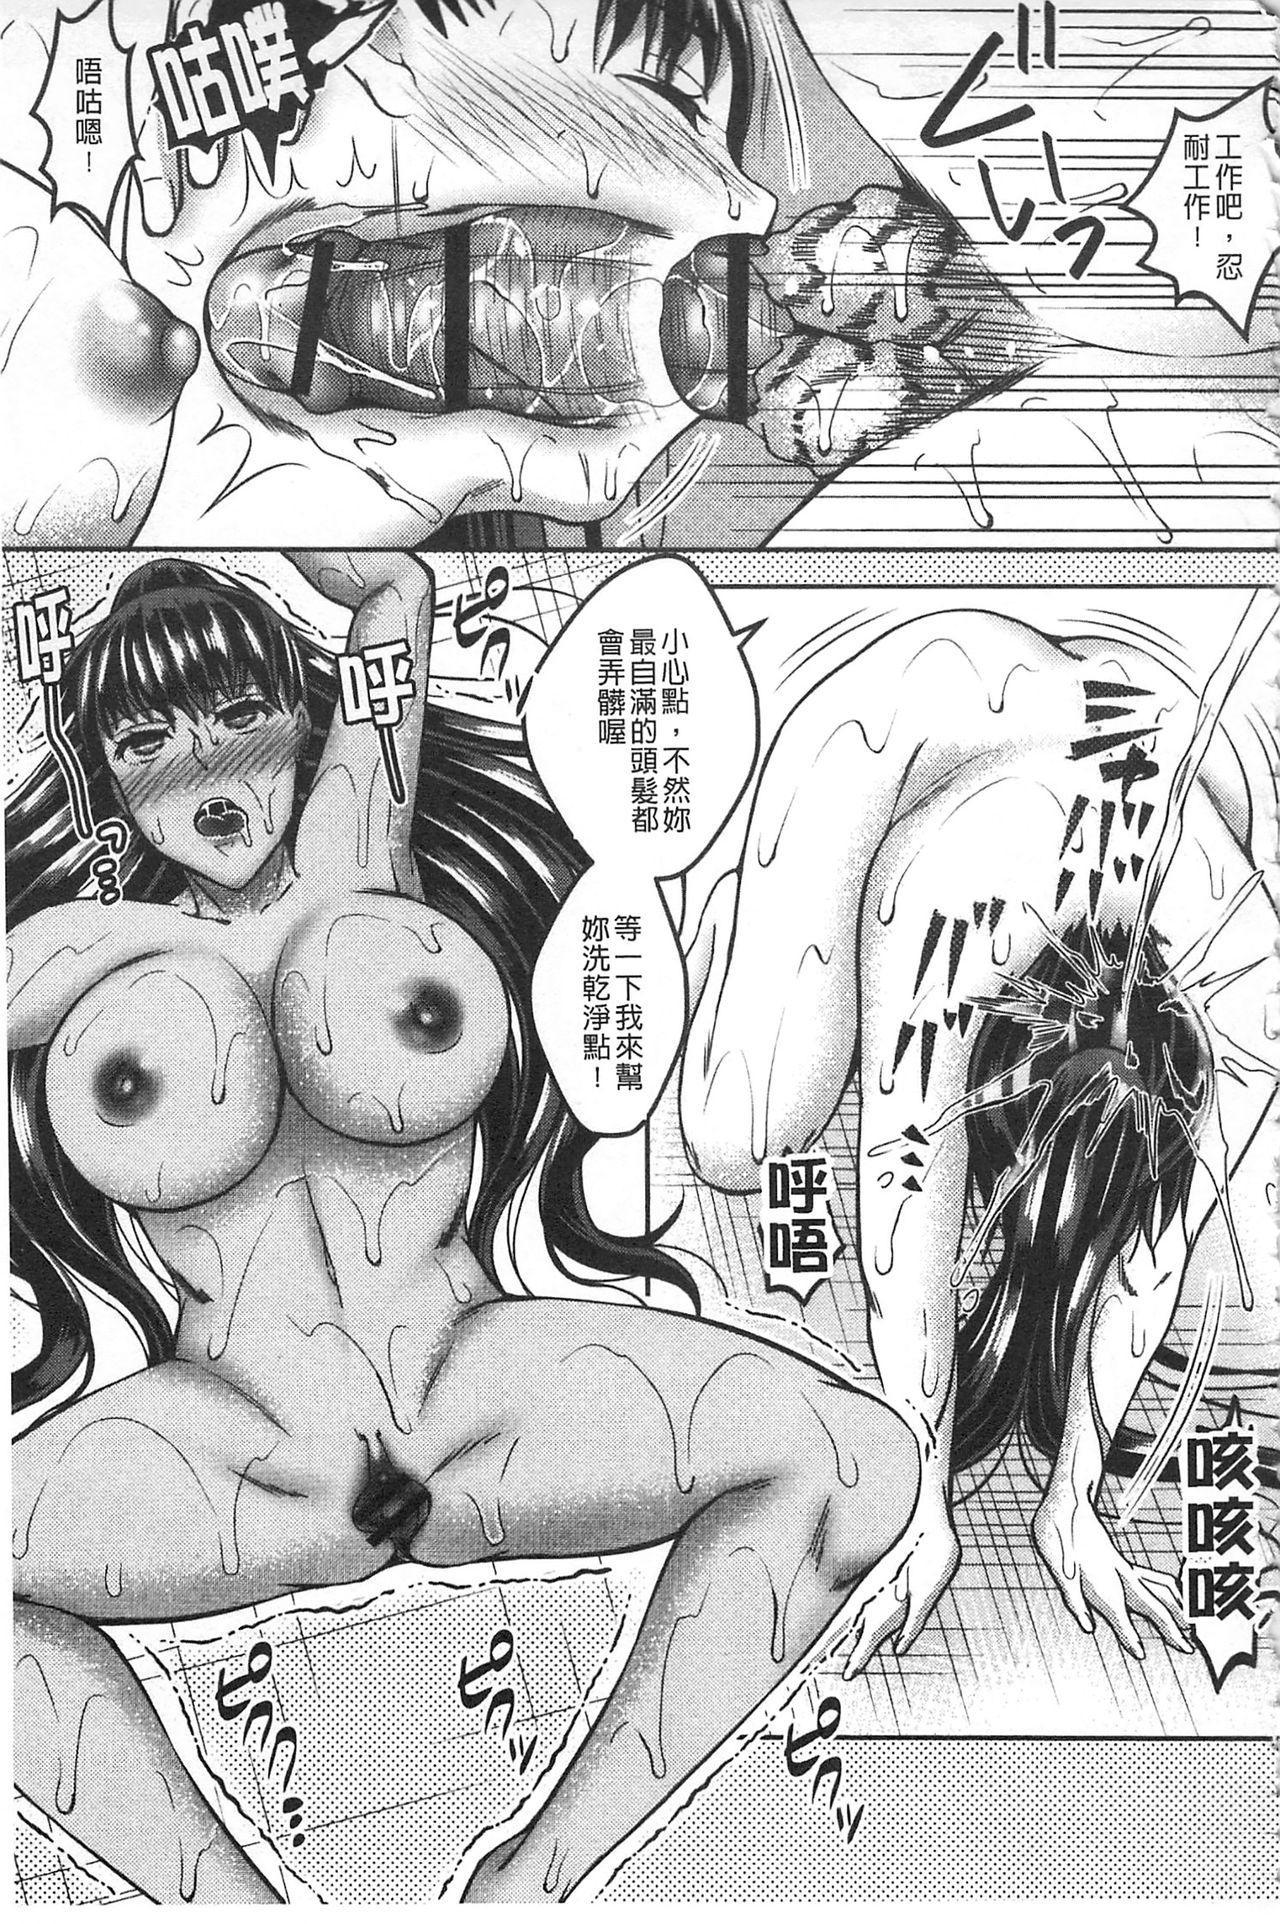 Kanjuku Otome no Odoshikata | 姦熟乙女的脅迫法 56